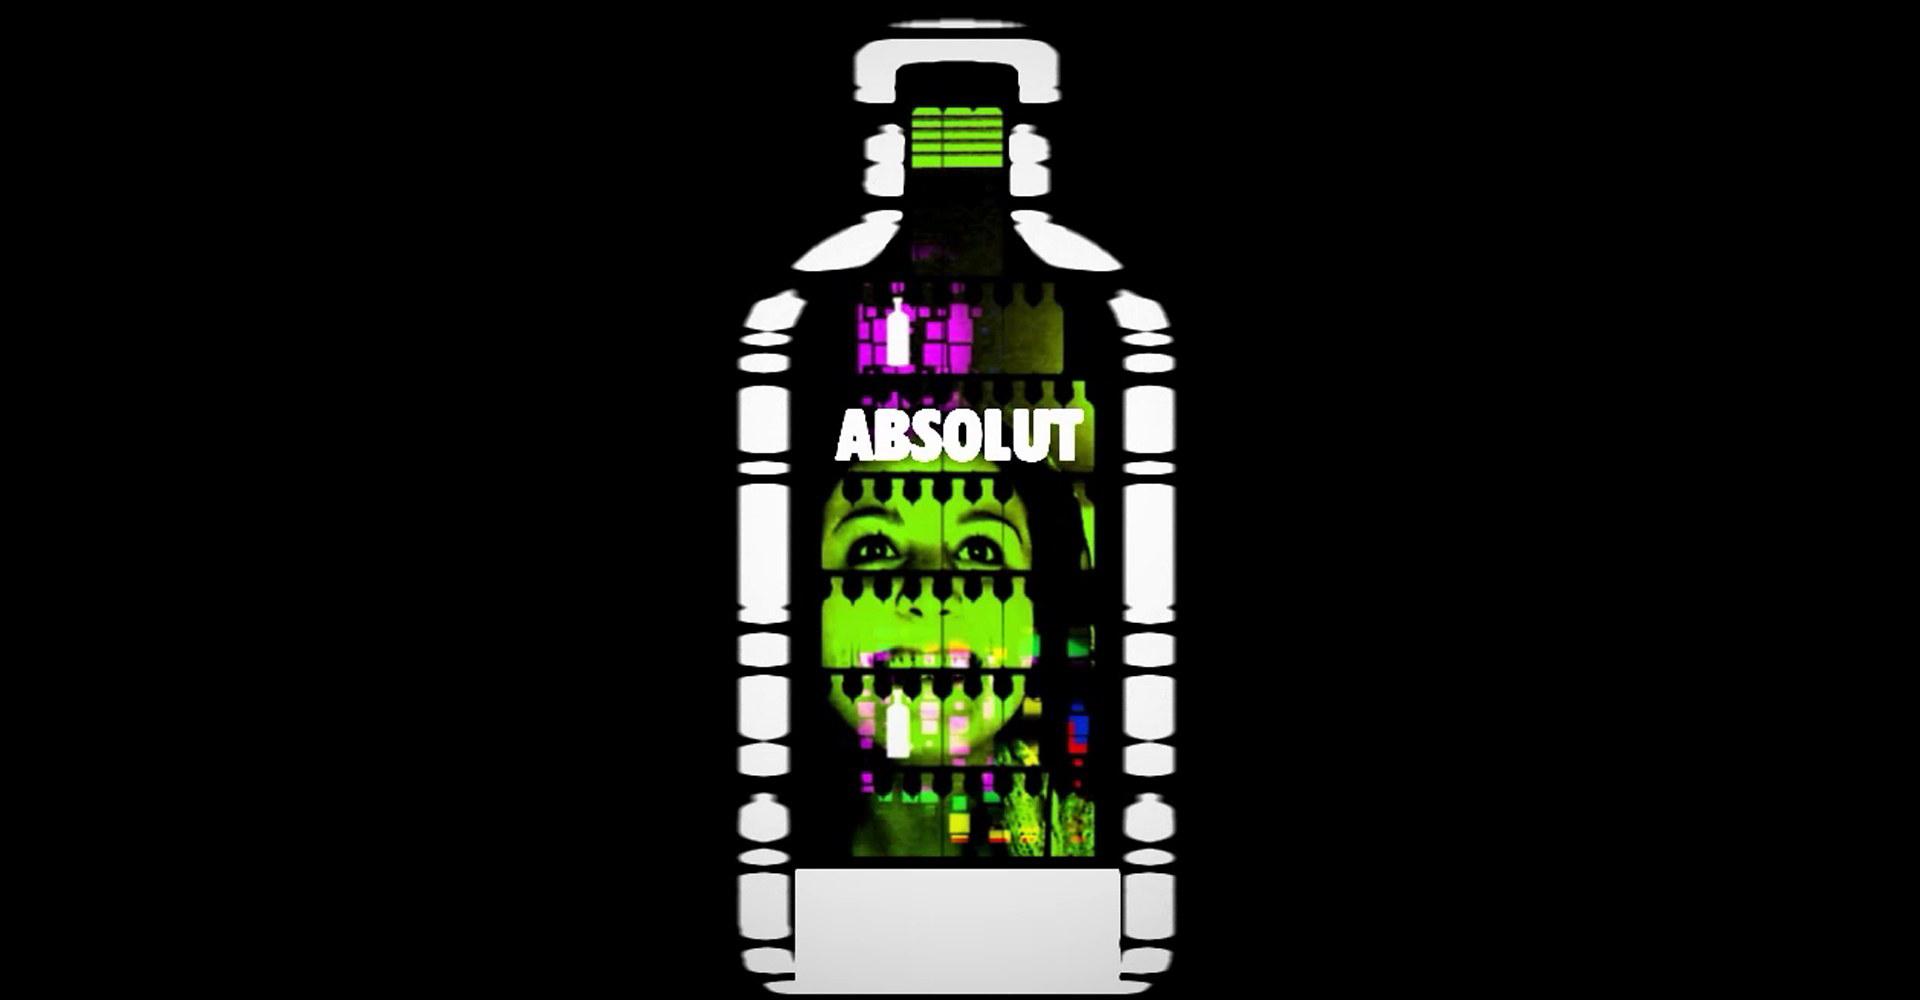 ultravioletto_Club-2-Club-Interactive-Installation-Absolut-Vodka-8